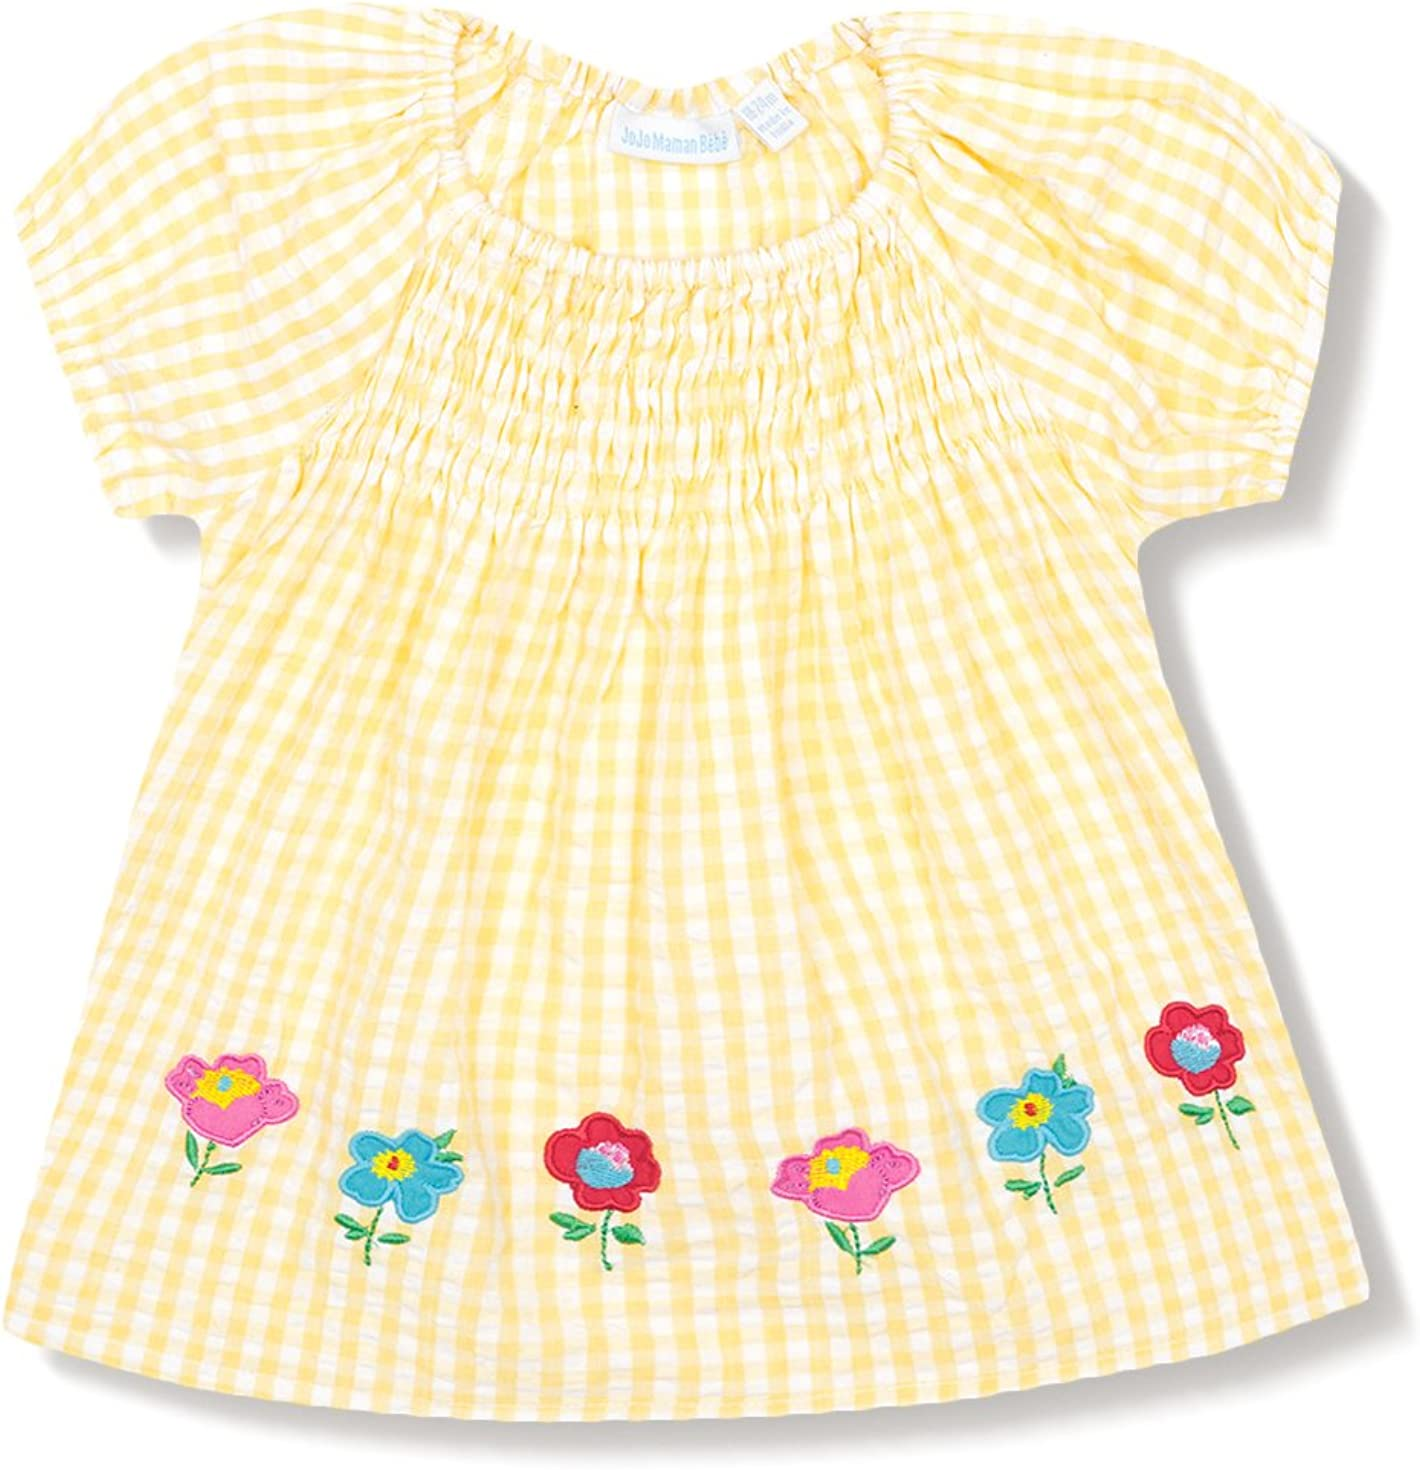 Kid Bebe Crochet Tube Tops Baby Girl Chest Wrap Clothing Children Infant Clothes